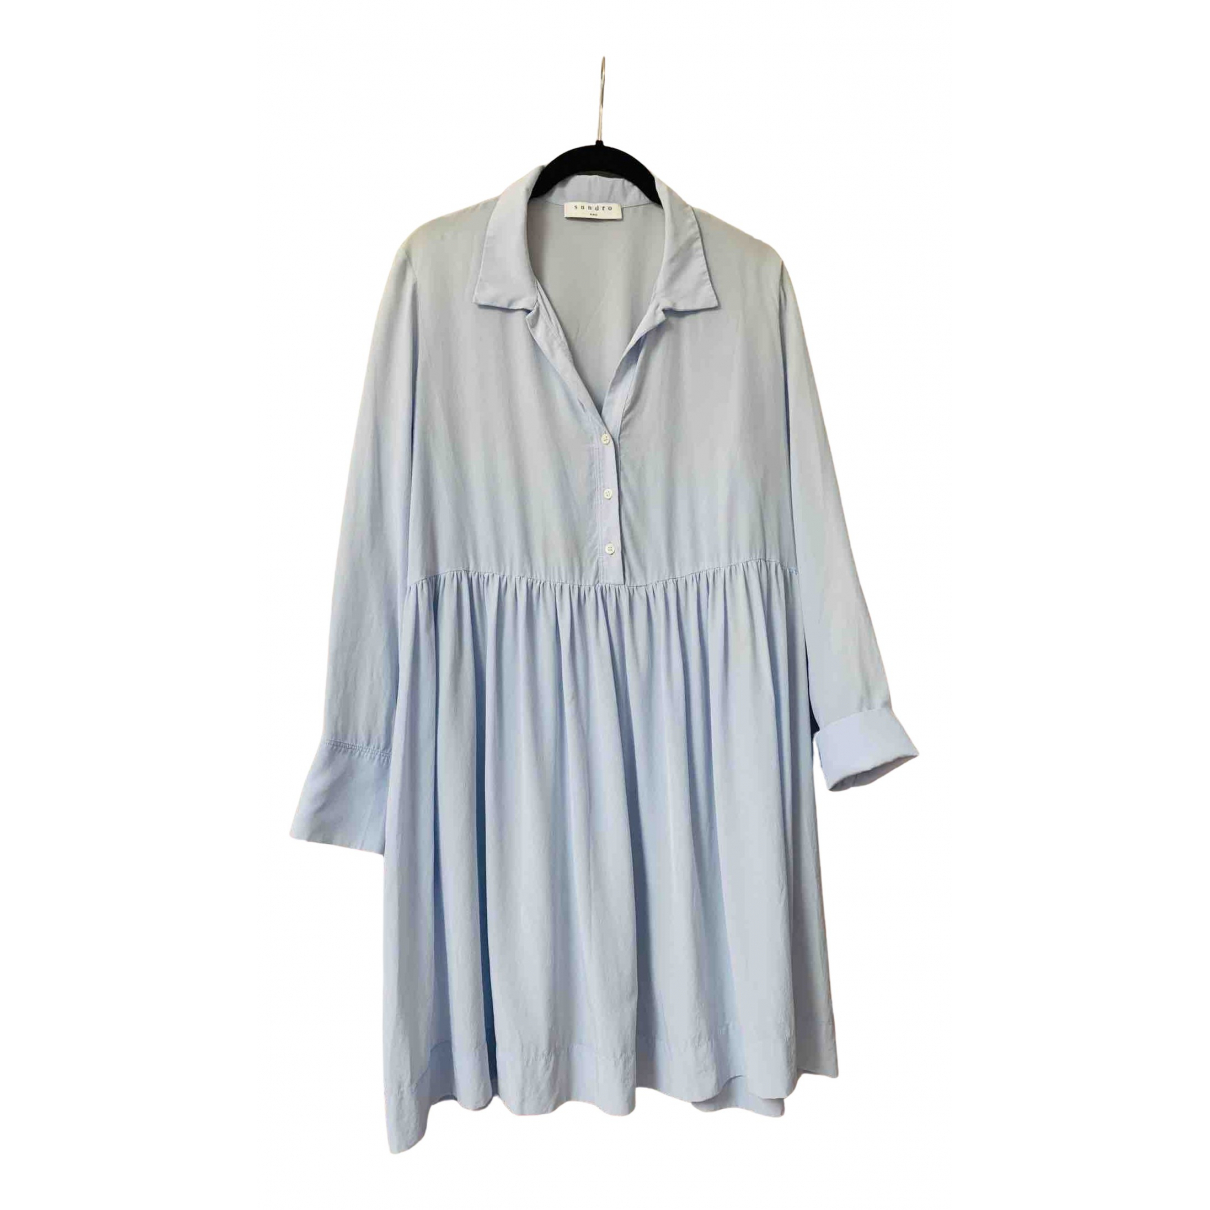 Sandro - Robe Spring Summer 2019 pour femme en soie - bleu